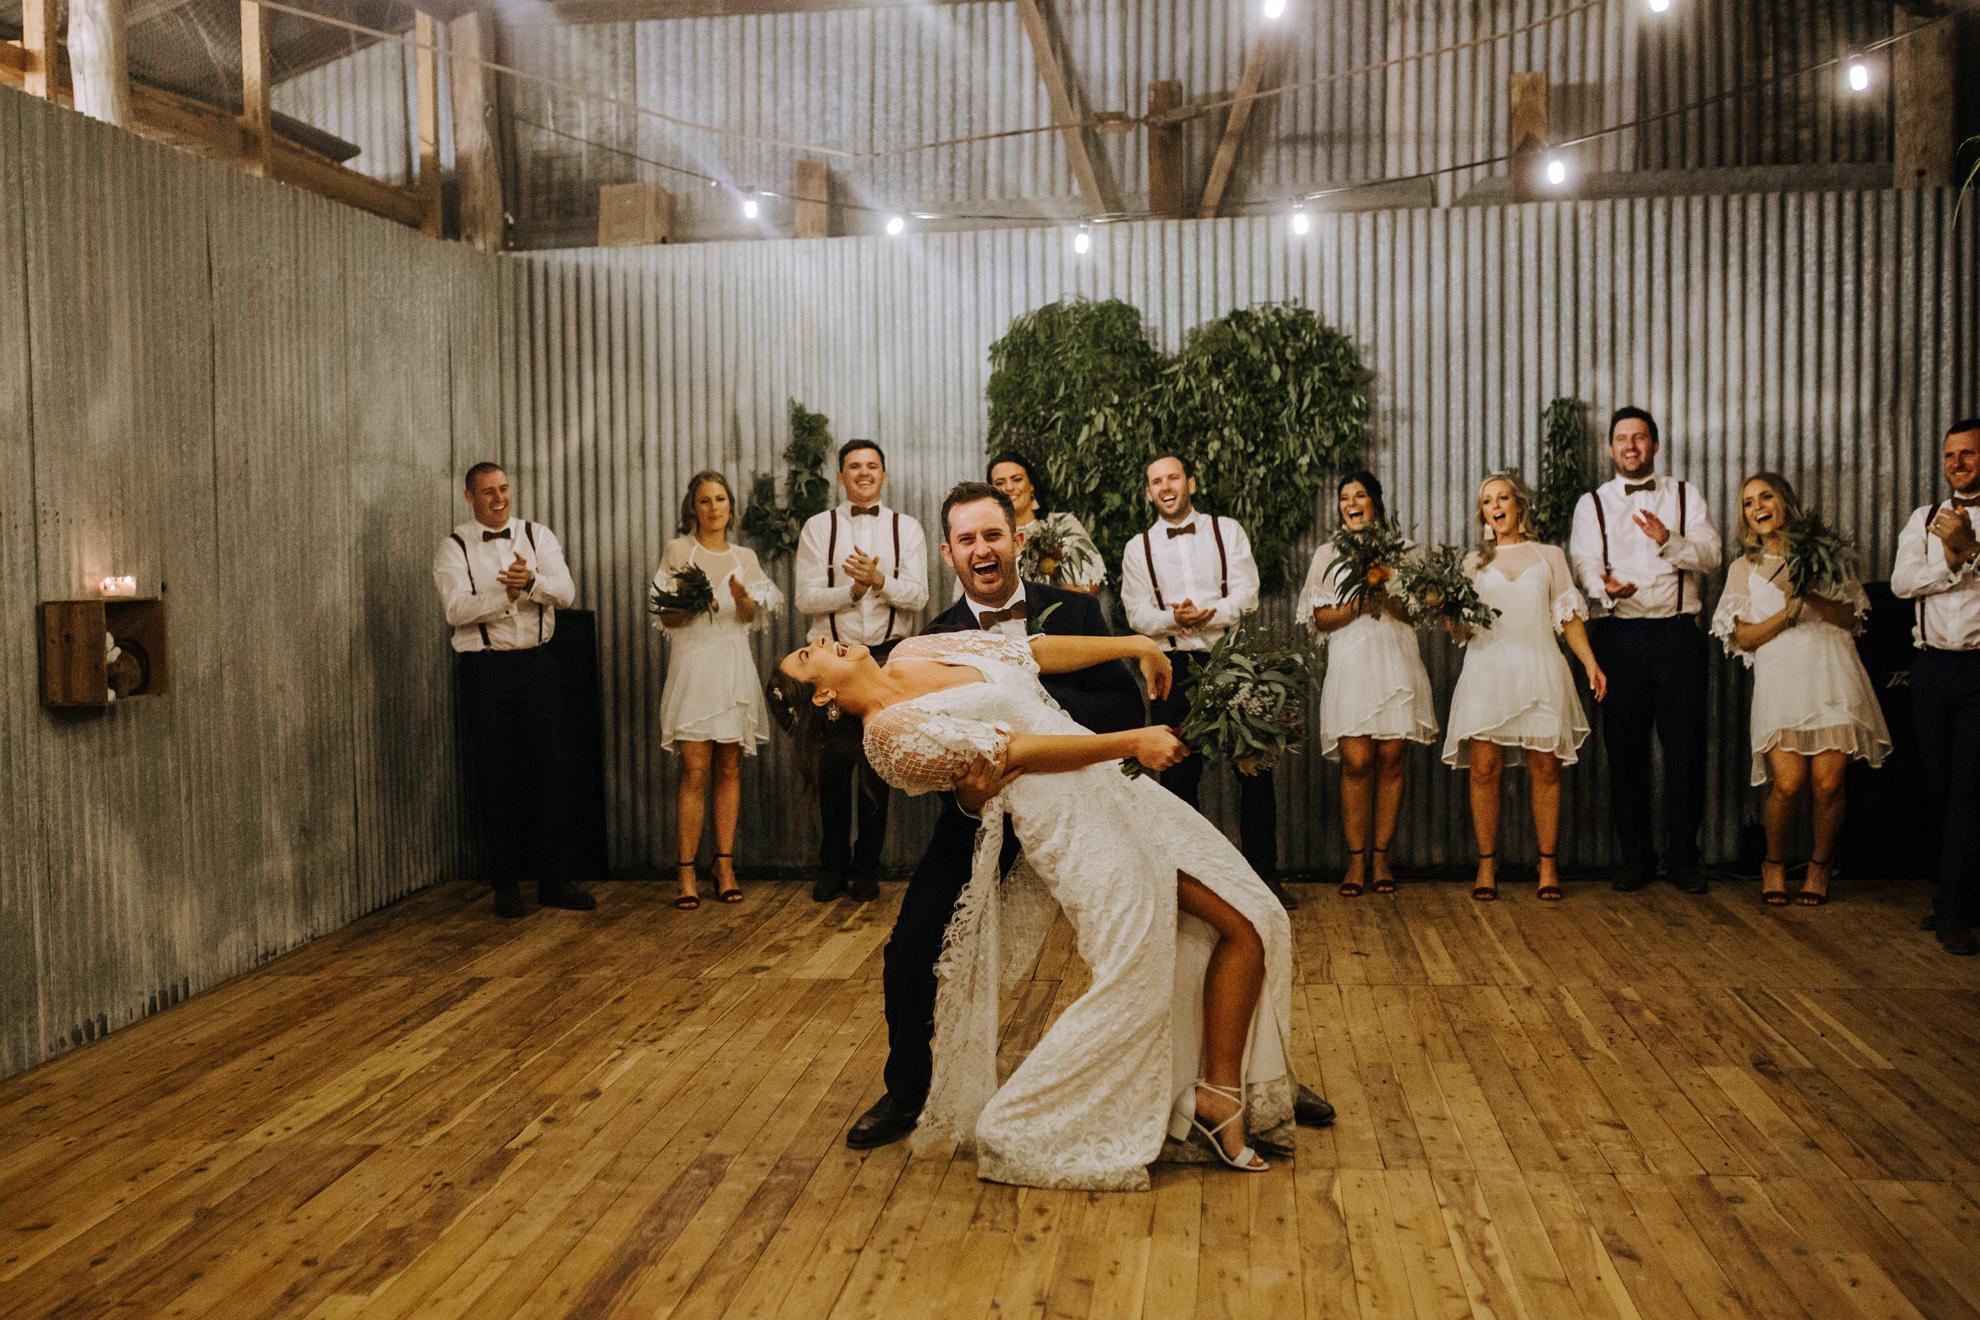 099-Jason_Jessie_Dalby_Country_Wedding.jpg